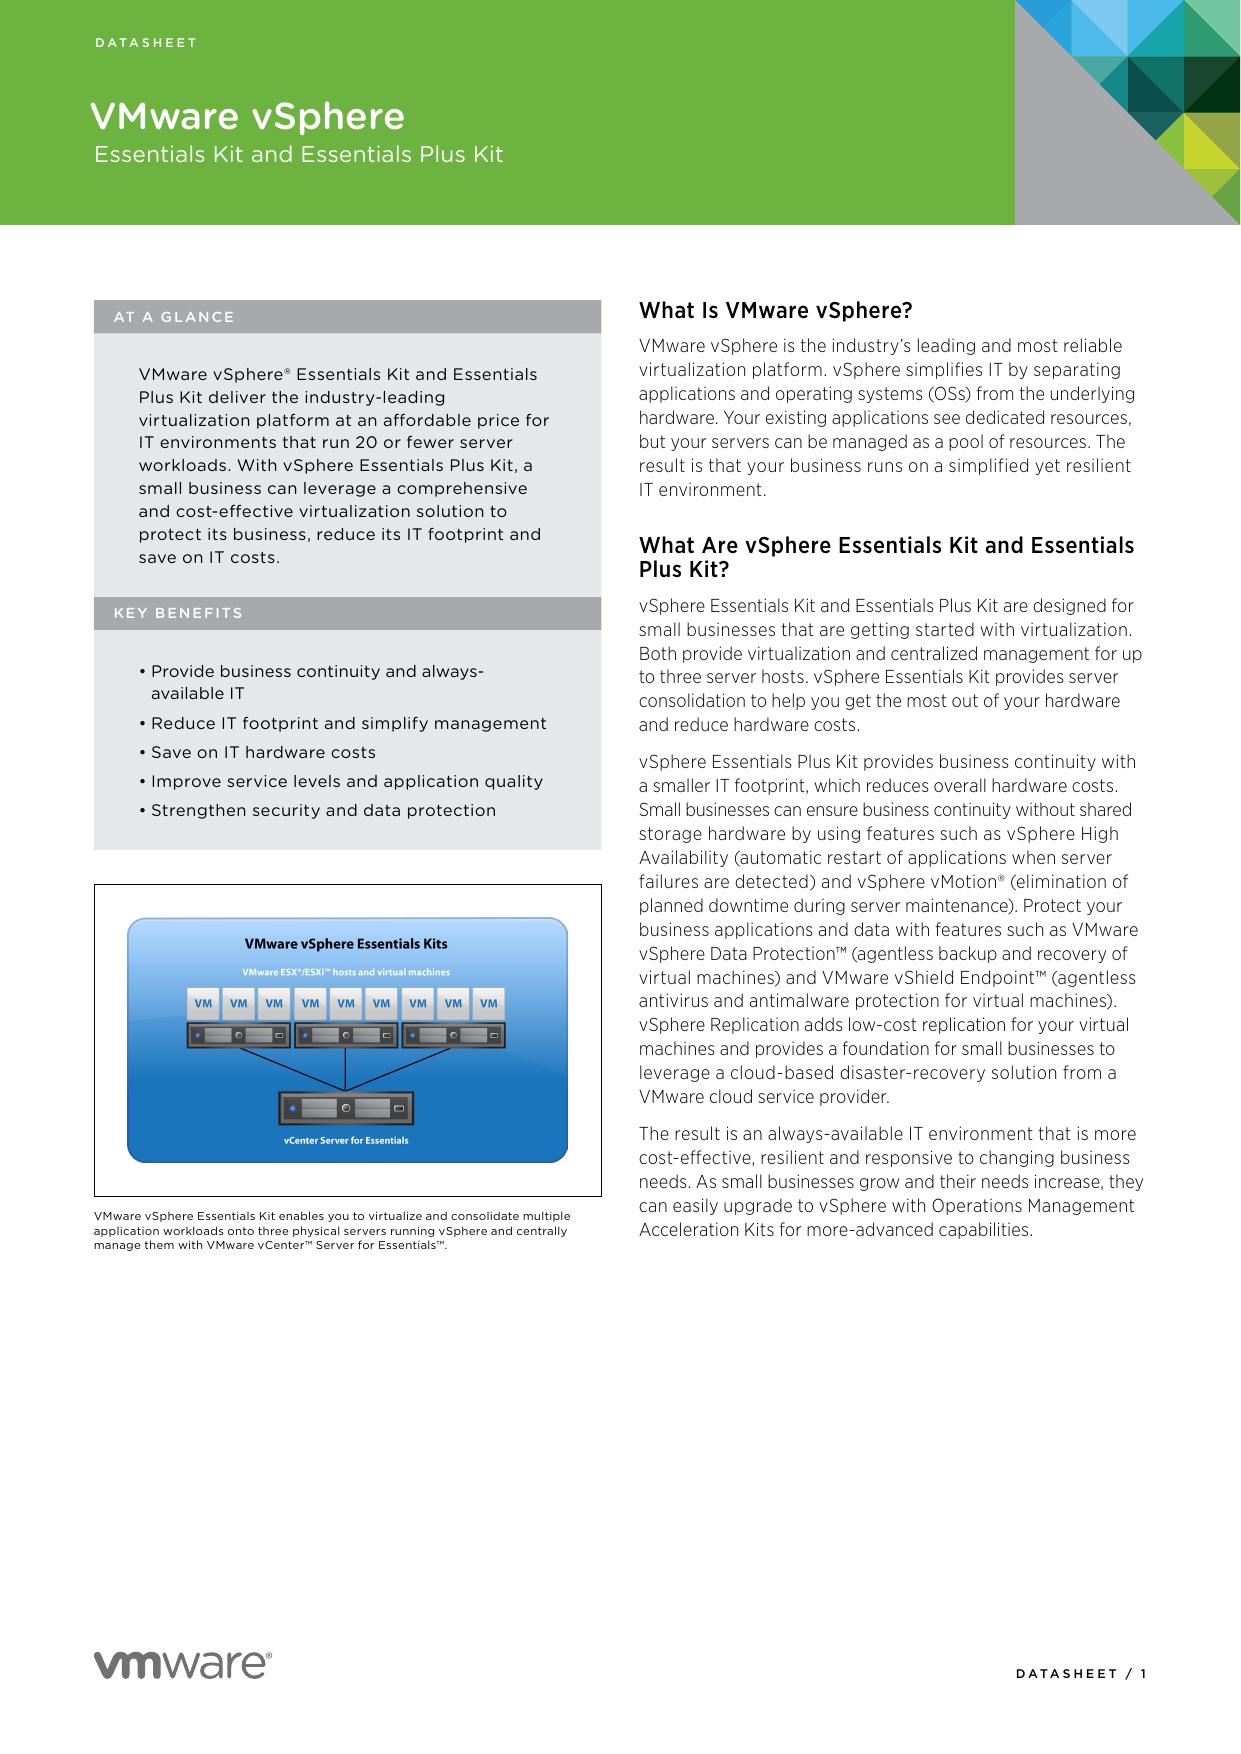 Essentials Kits Datasheet